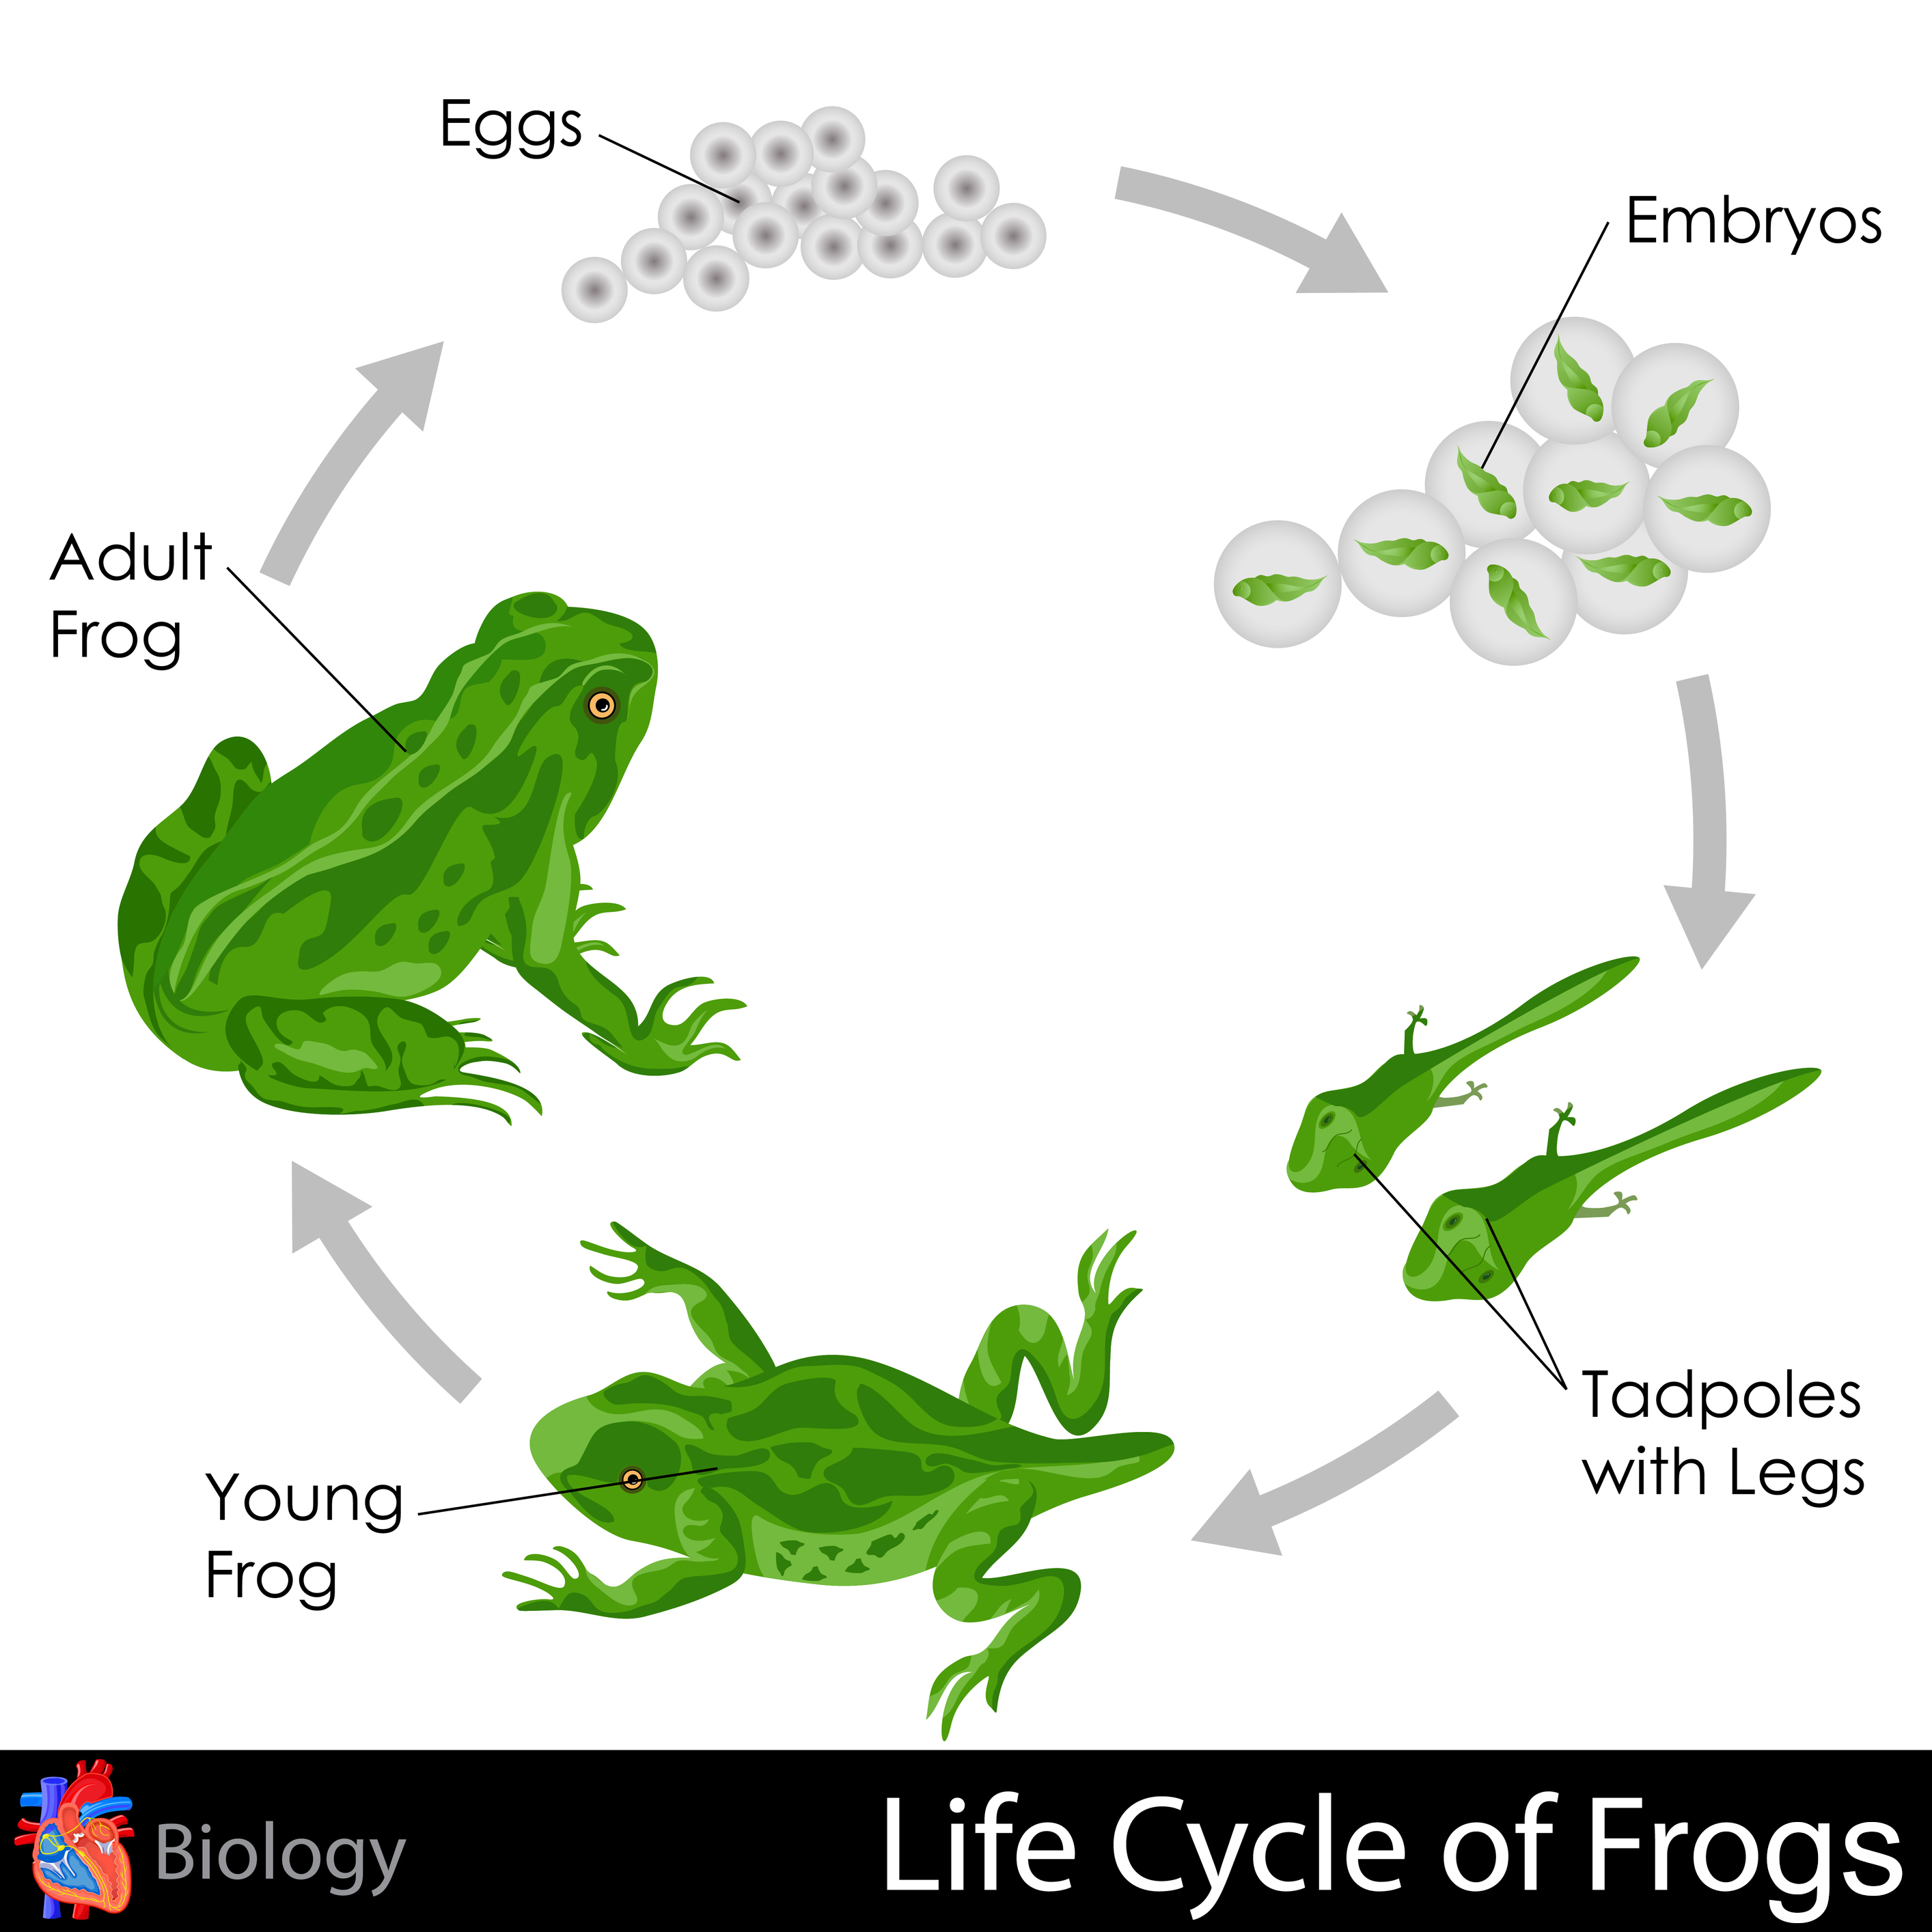 Worksheet Life Cycle Of A Frog Worksheet Grass Fedjp Worksheet Study Site